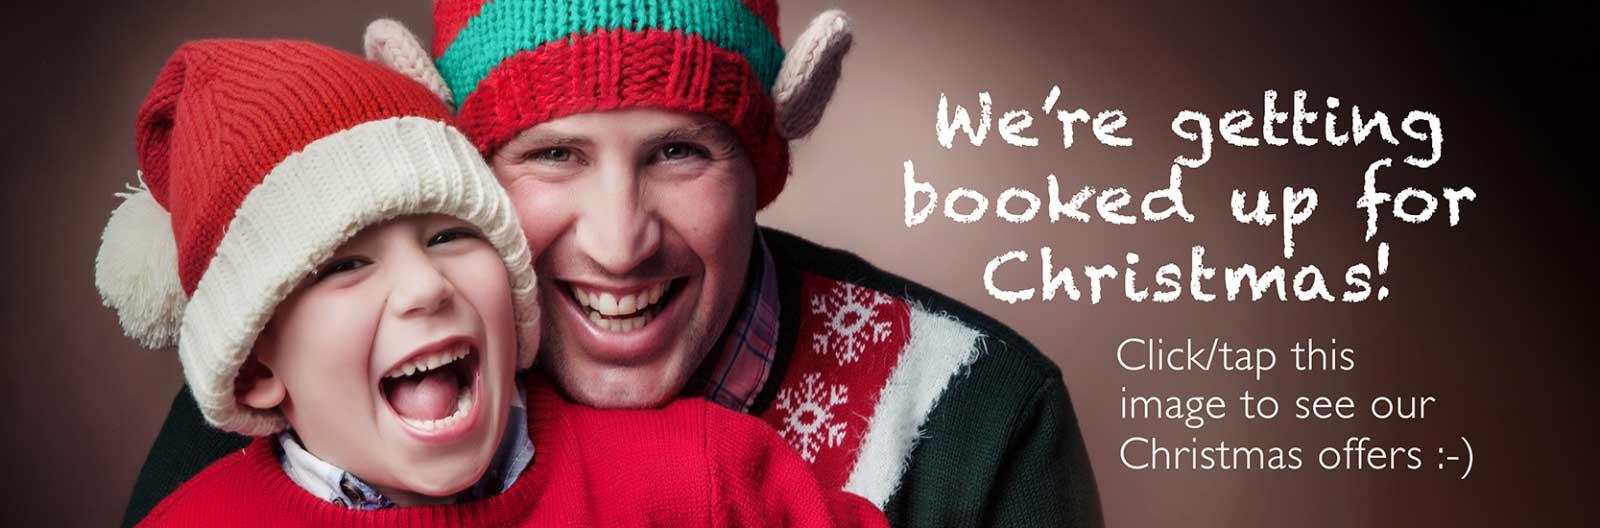 Christmas-Photoshoot-banner-160-x-528